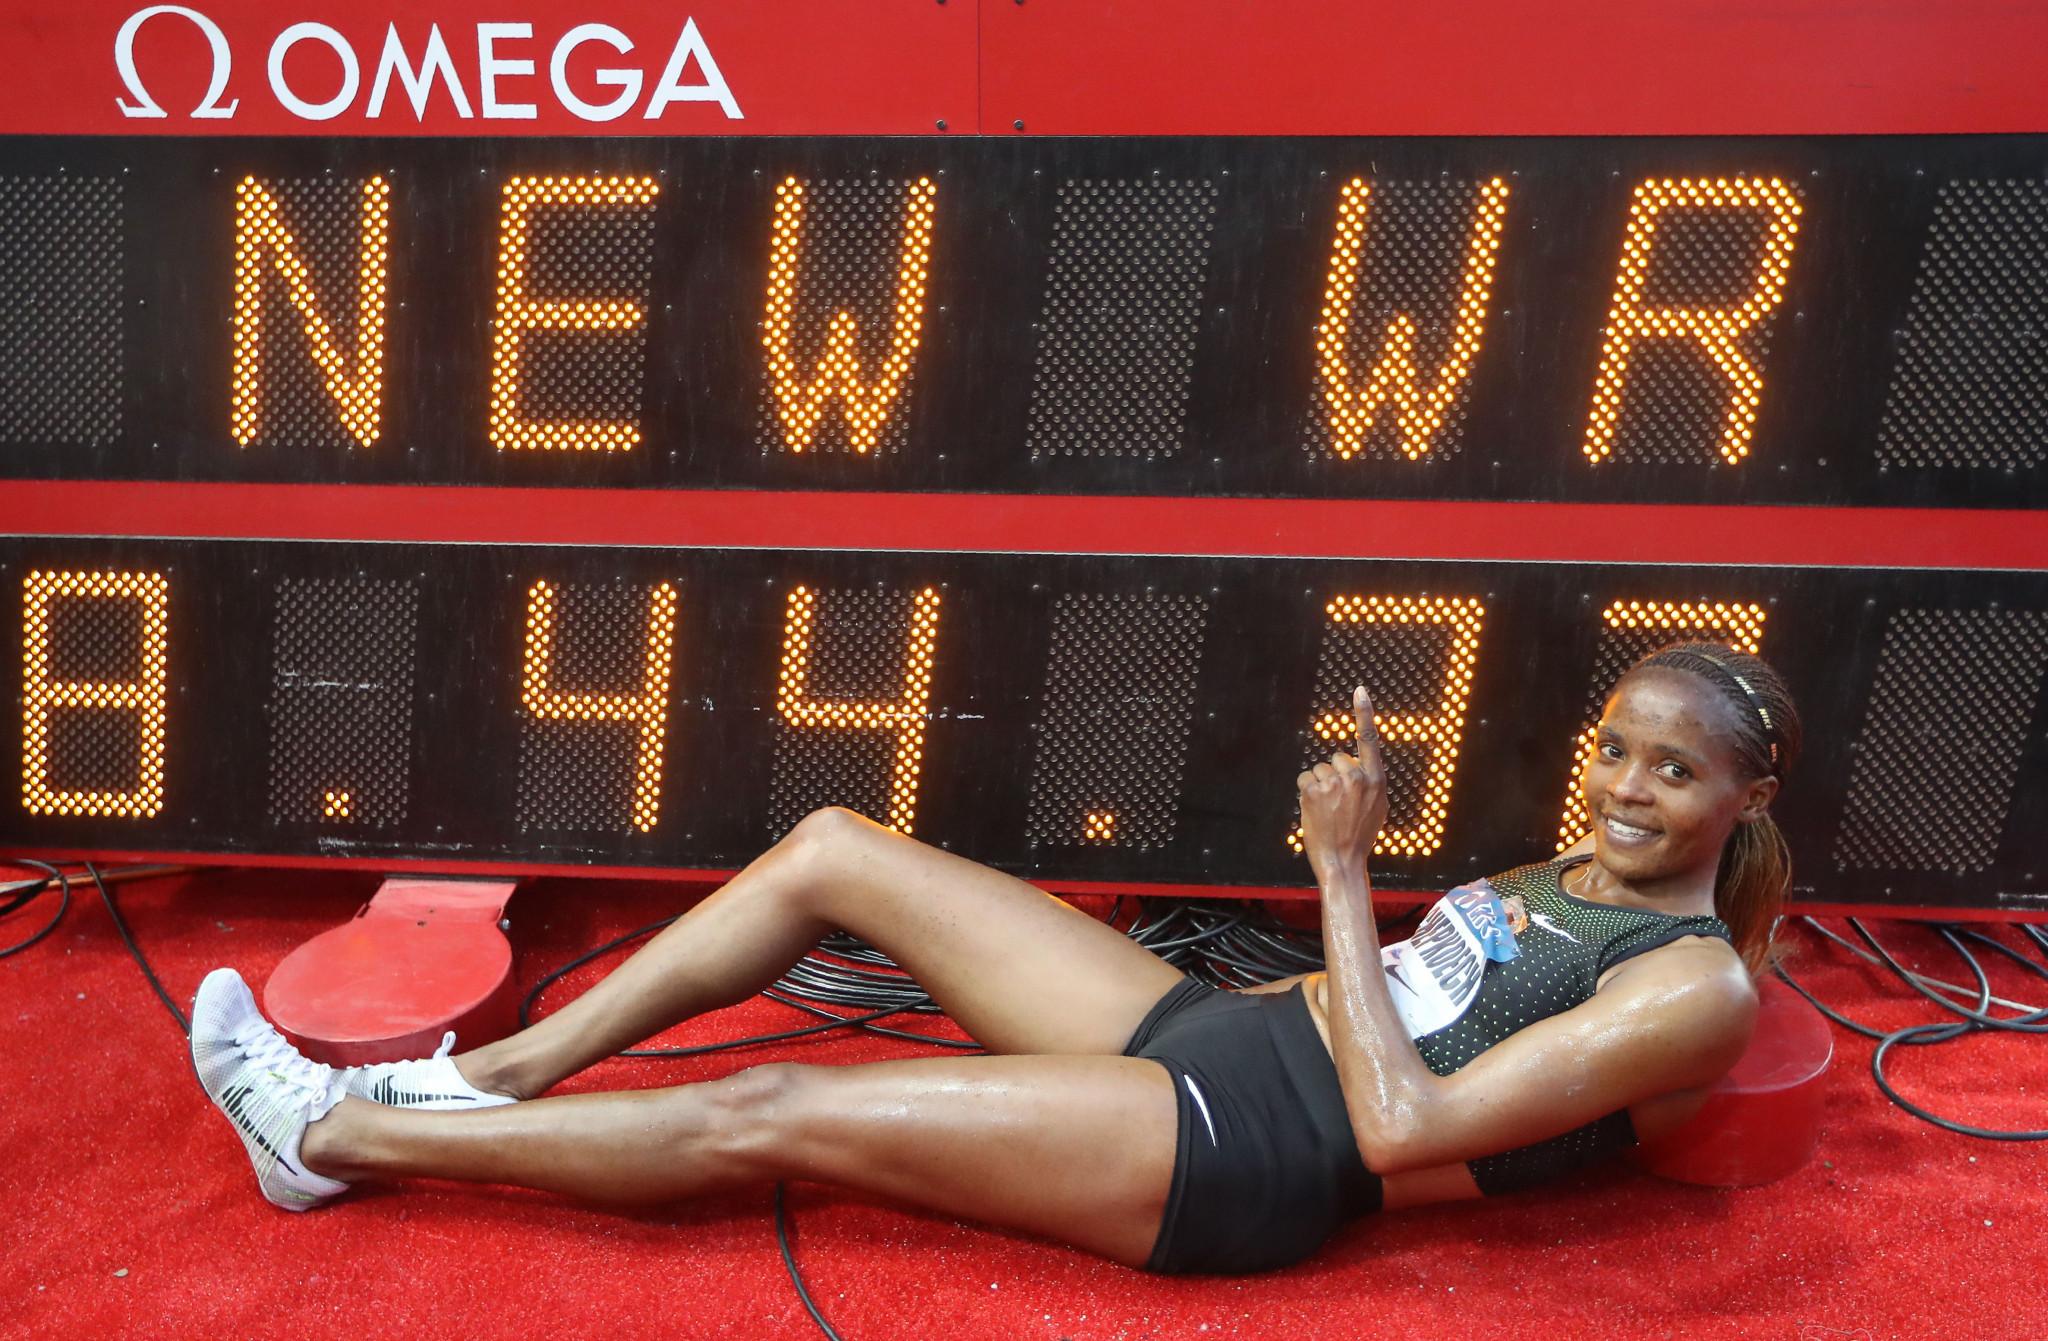 Chepkoech destroys women's 3,000m steeplechase world record at Monaco Diamond League